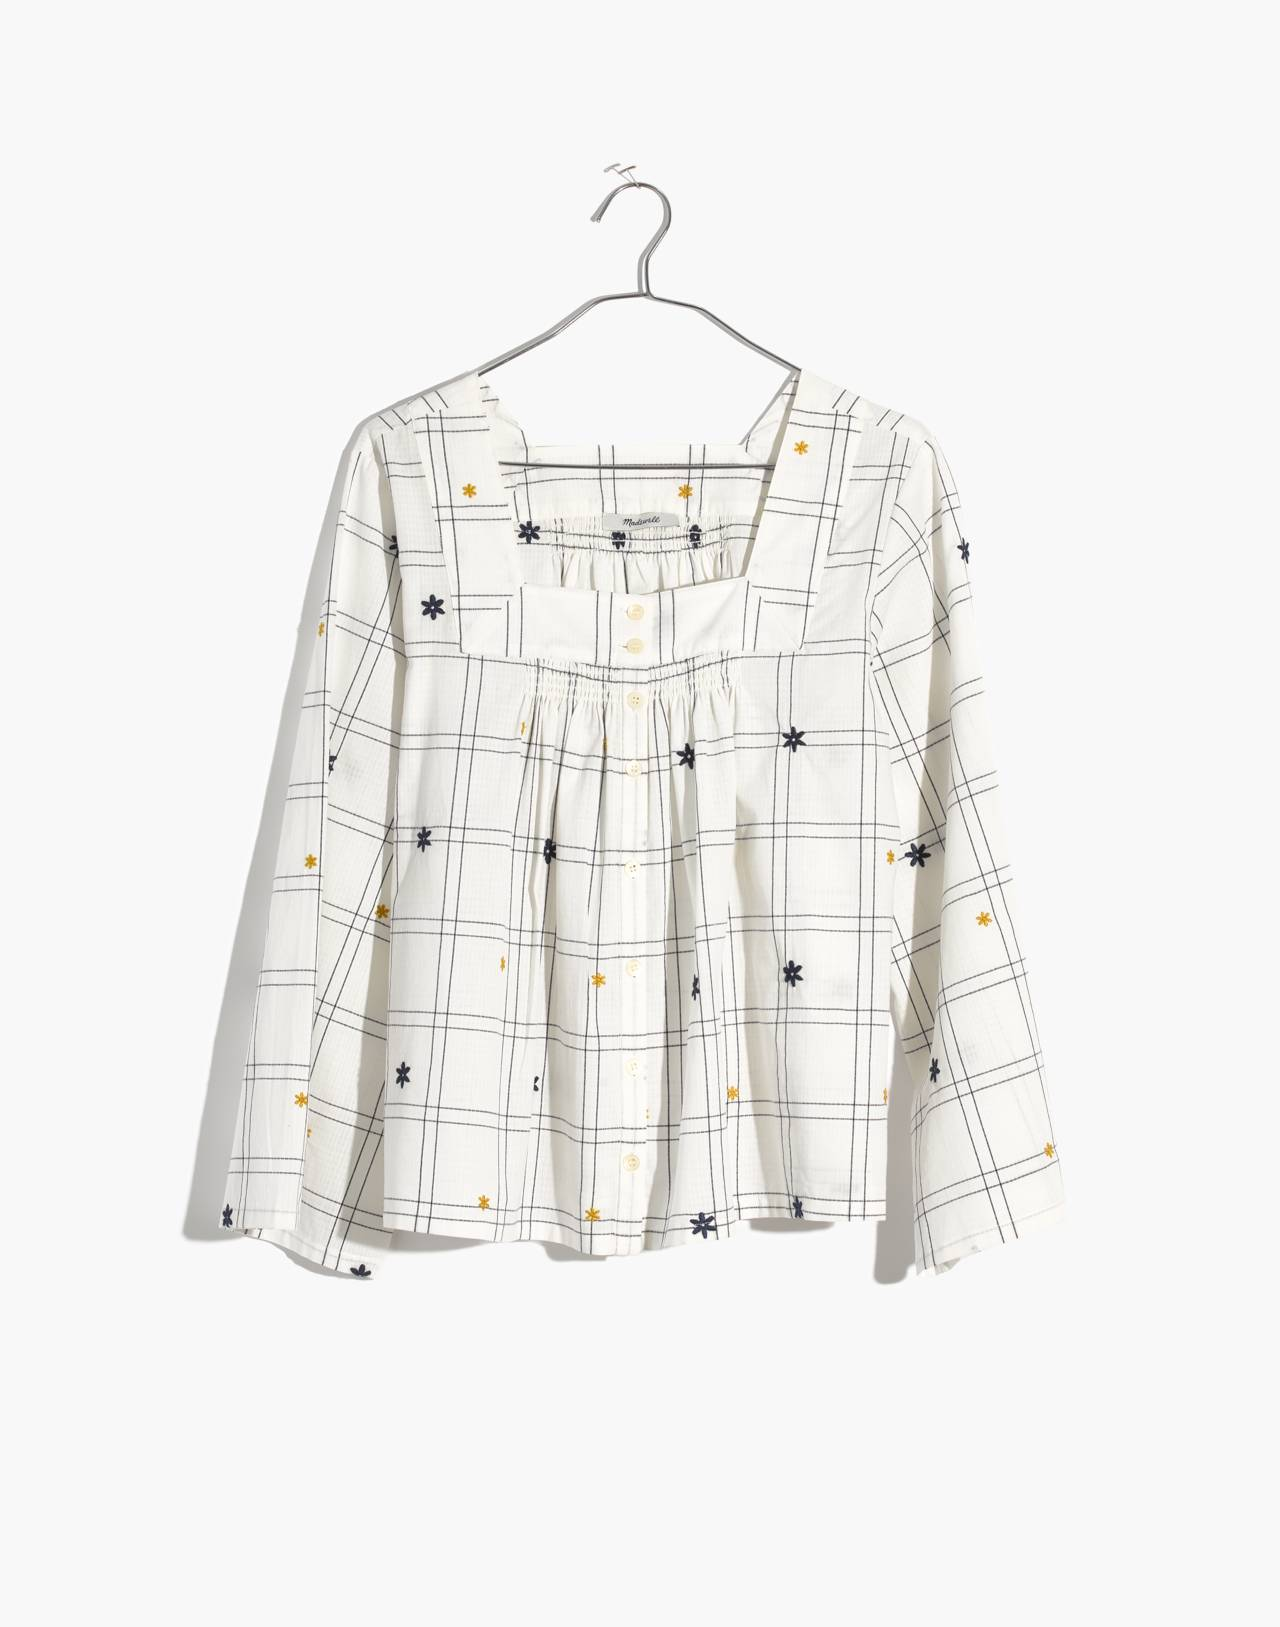 Embroidered Windowpane Square-Neck Button-Down Top in white wash image 4